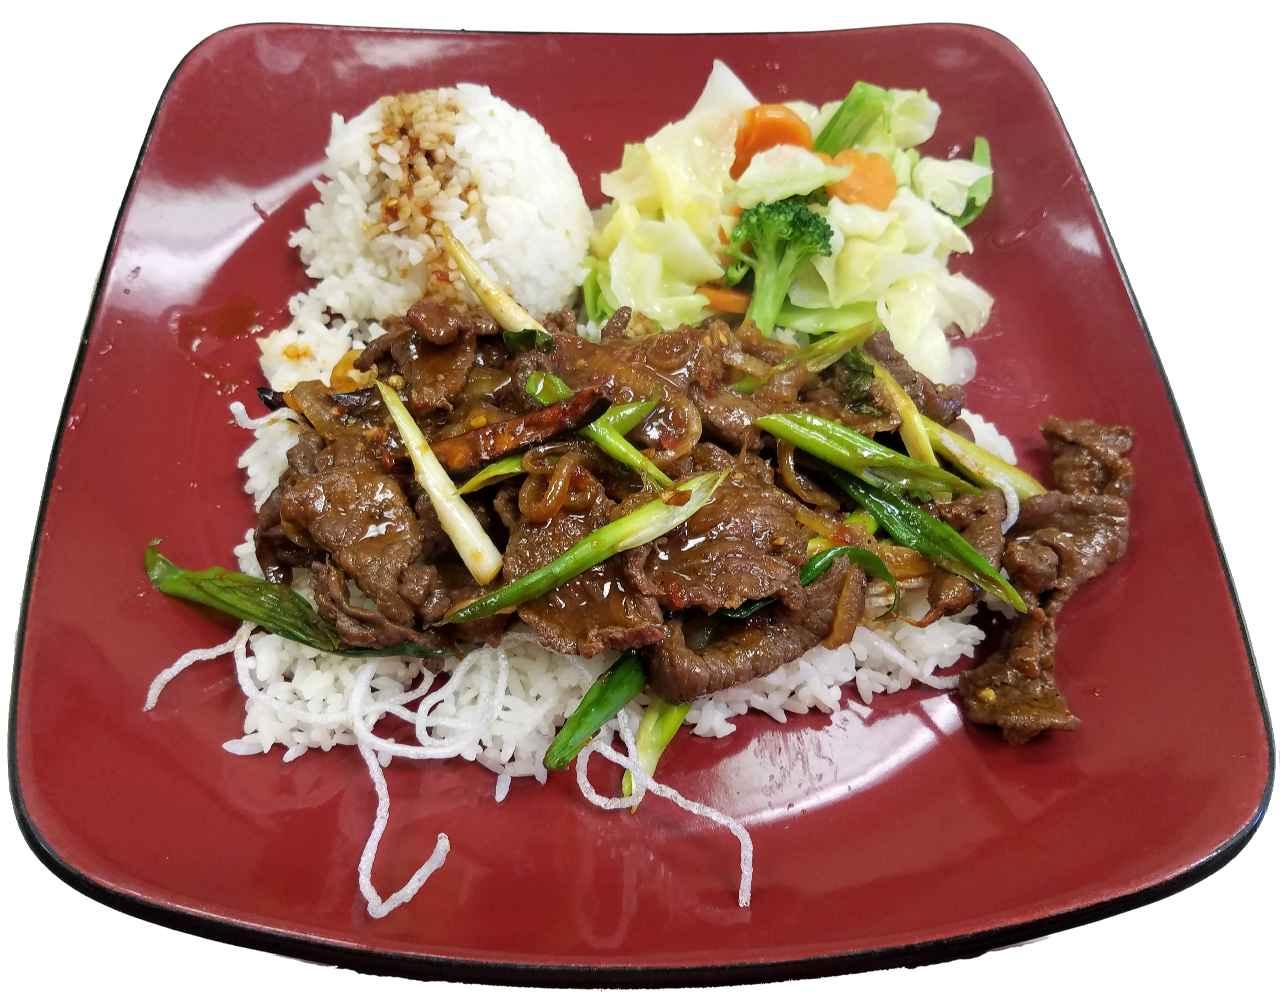 14. Spicy Mongolian Beef – HOT!